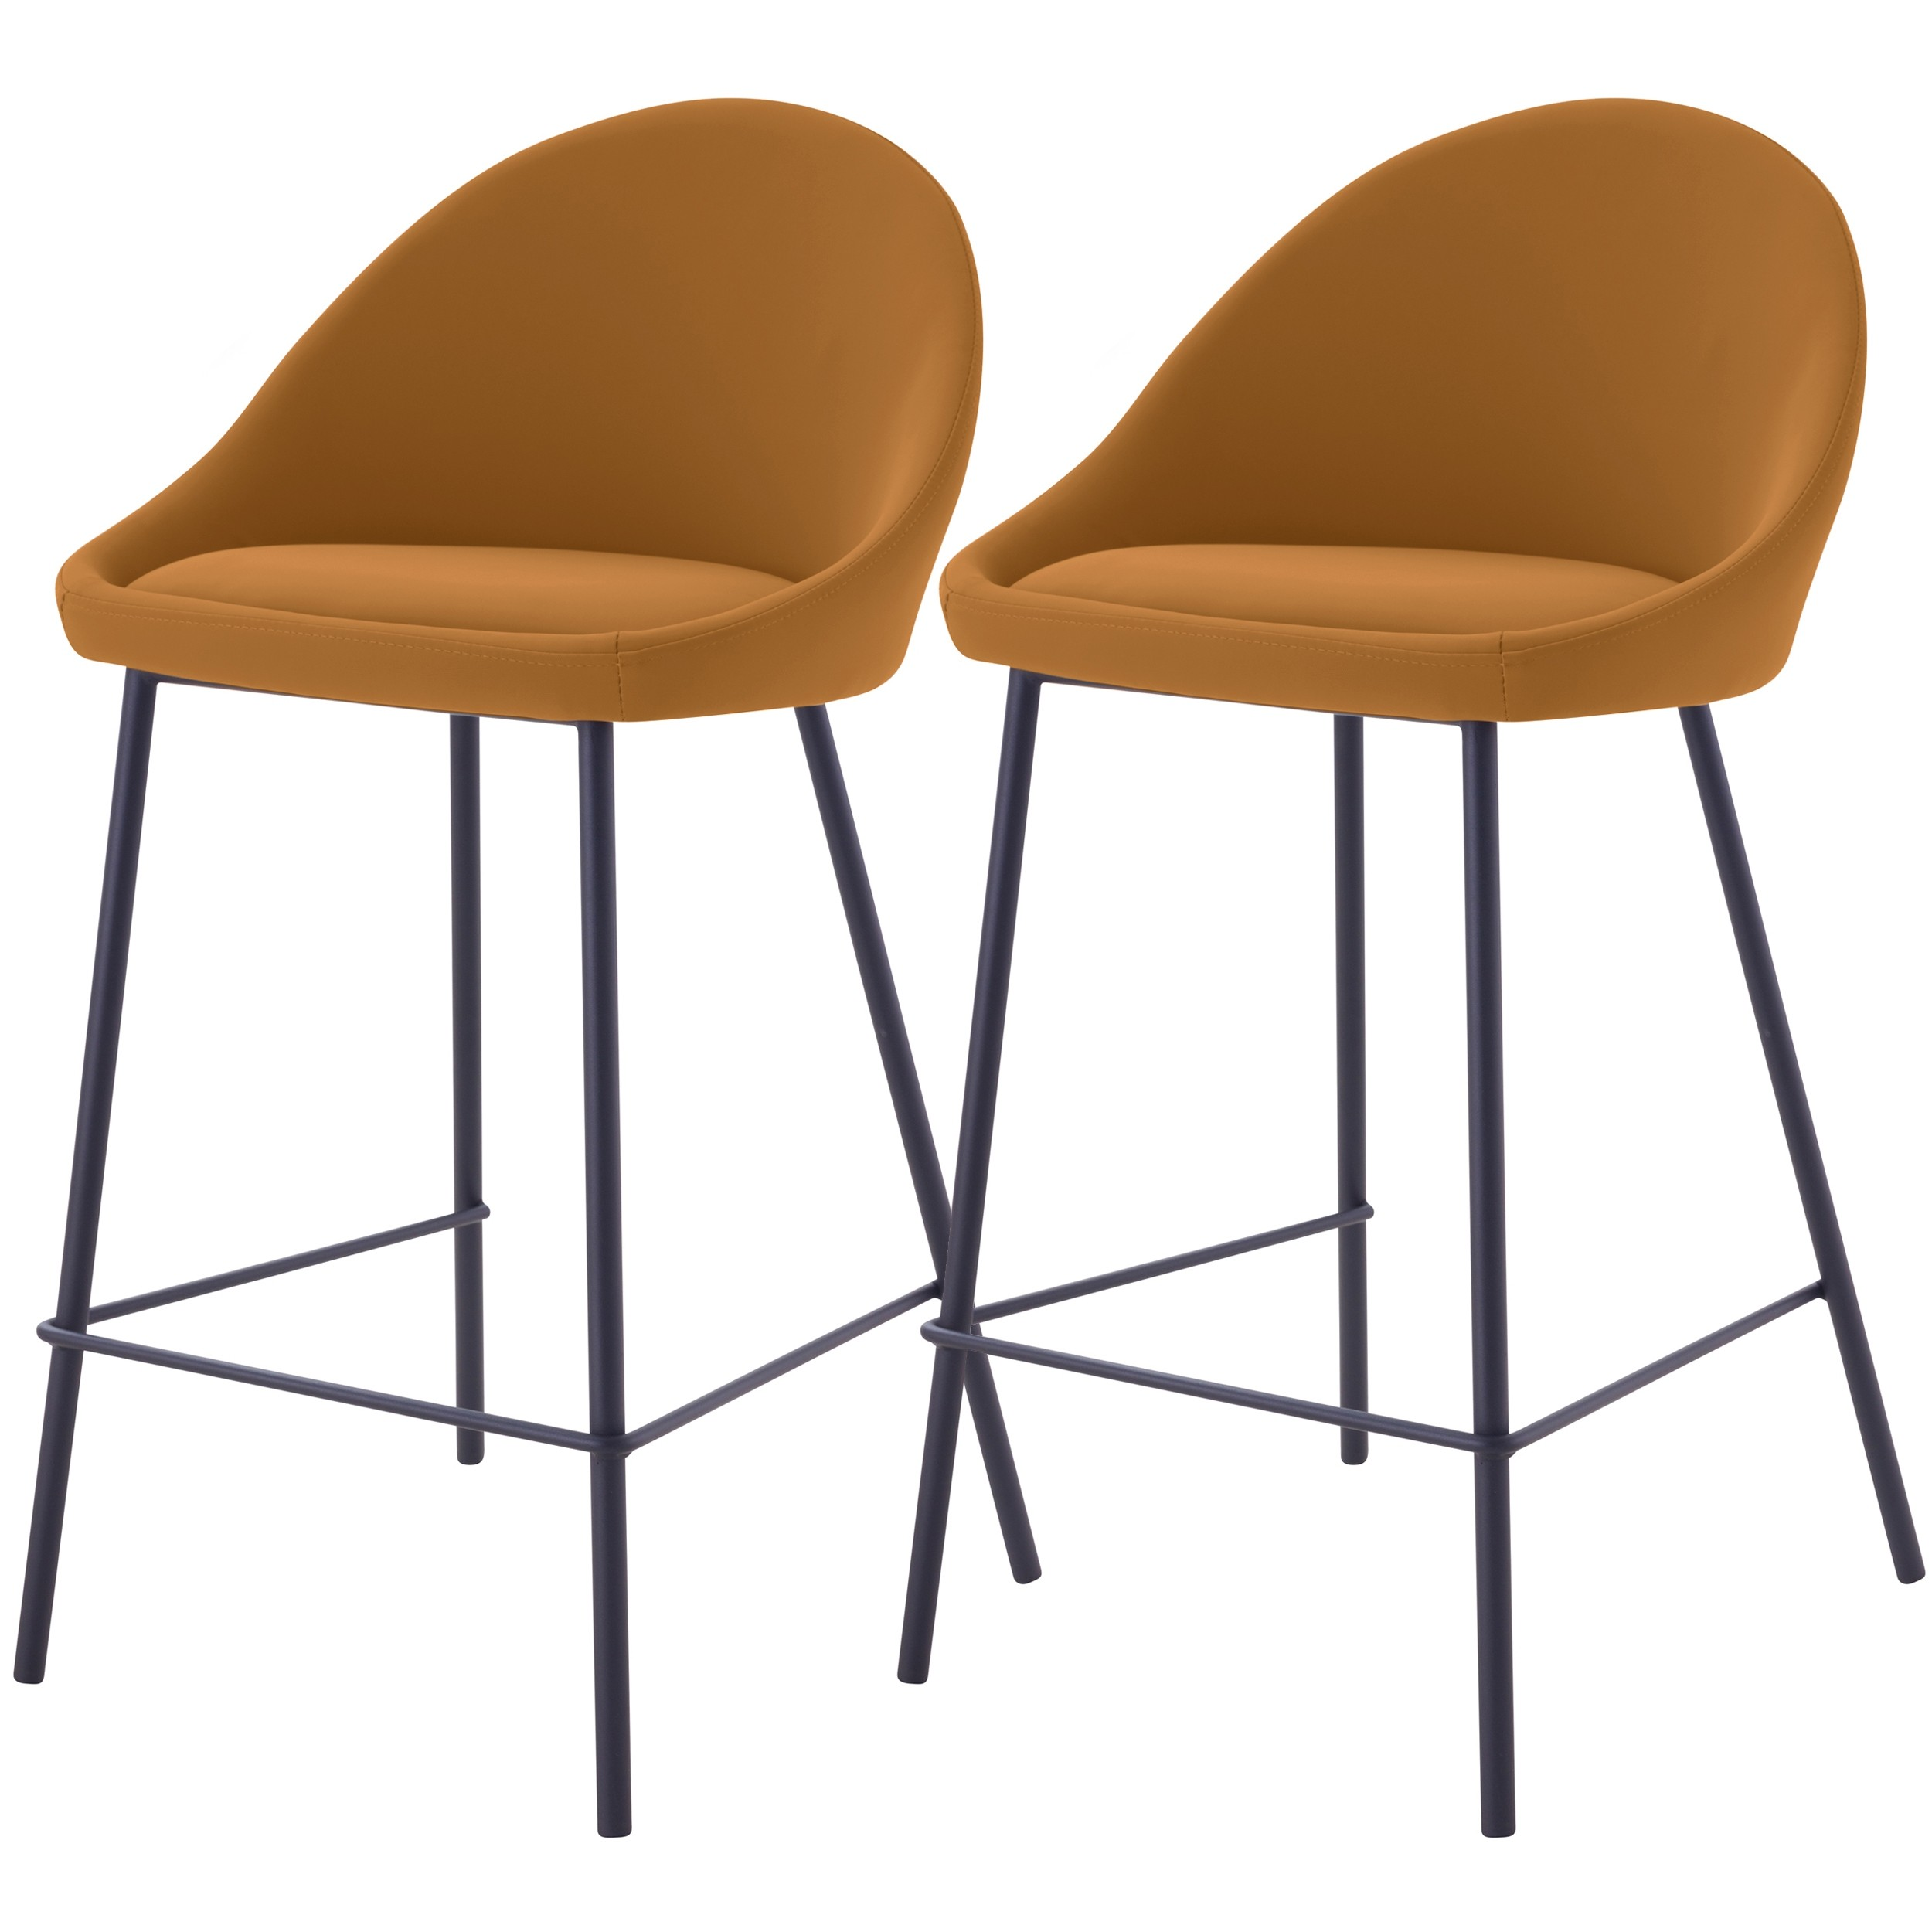 acheter chaise de bar ocres lot de 2